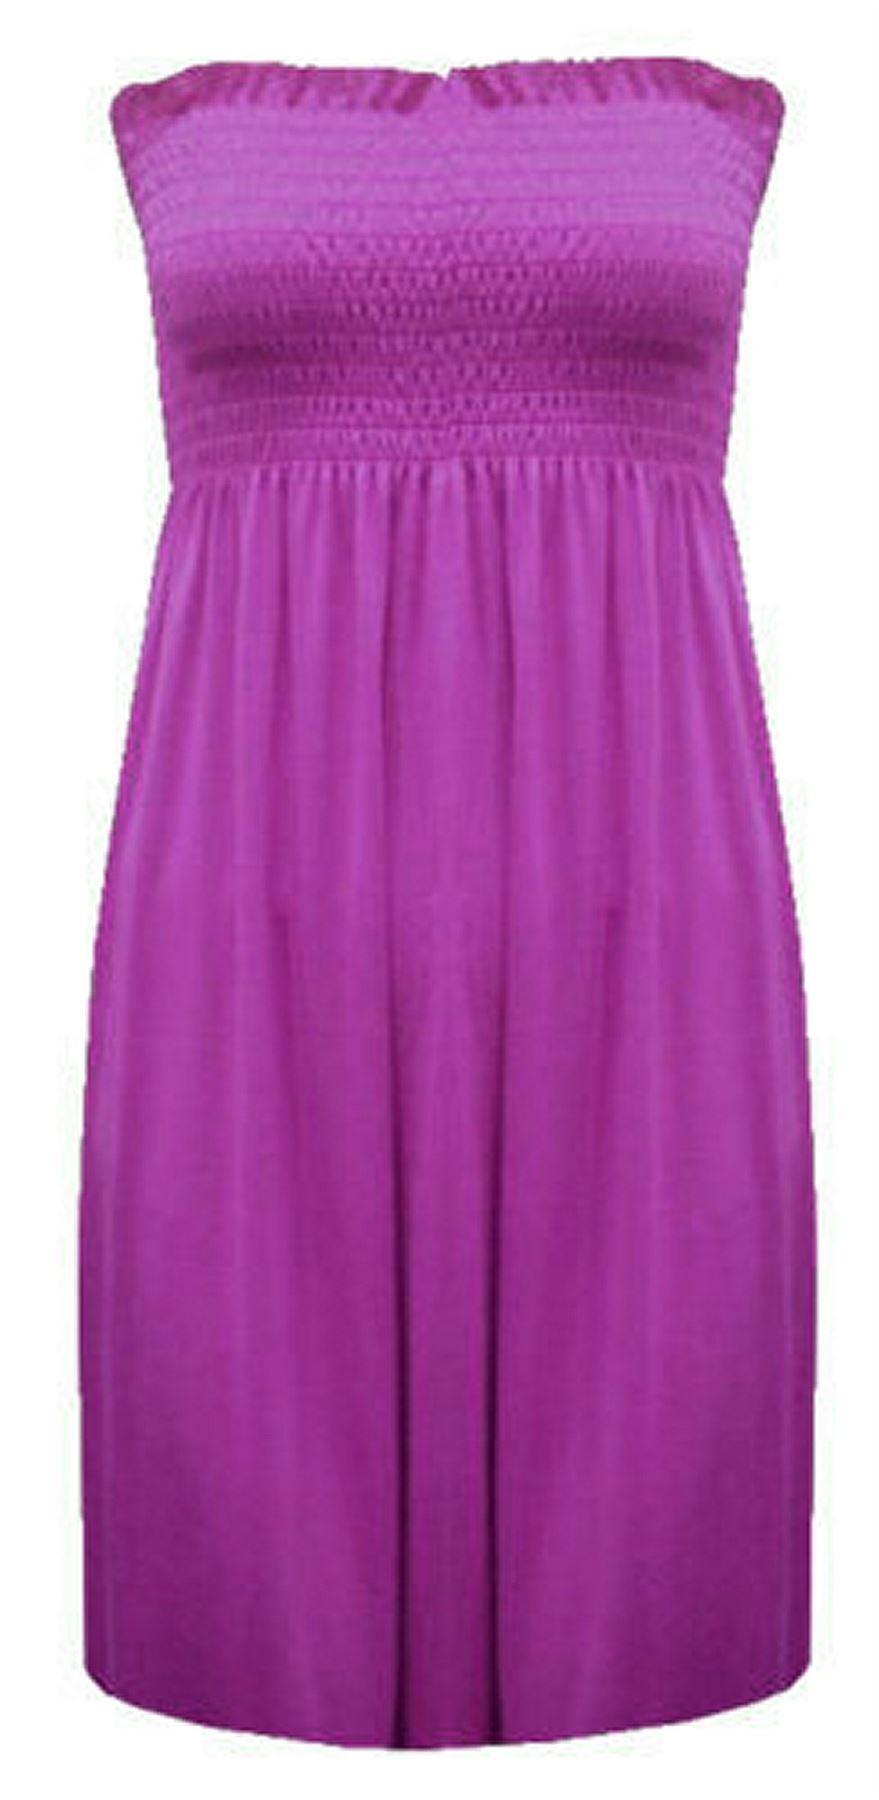 New-Ladies-Bandeau-Boob-Gathering-Tops-Boob-Tube-Beach-Wear-Tunics-8-26 thumbnail 56